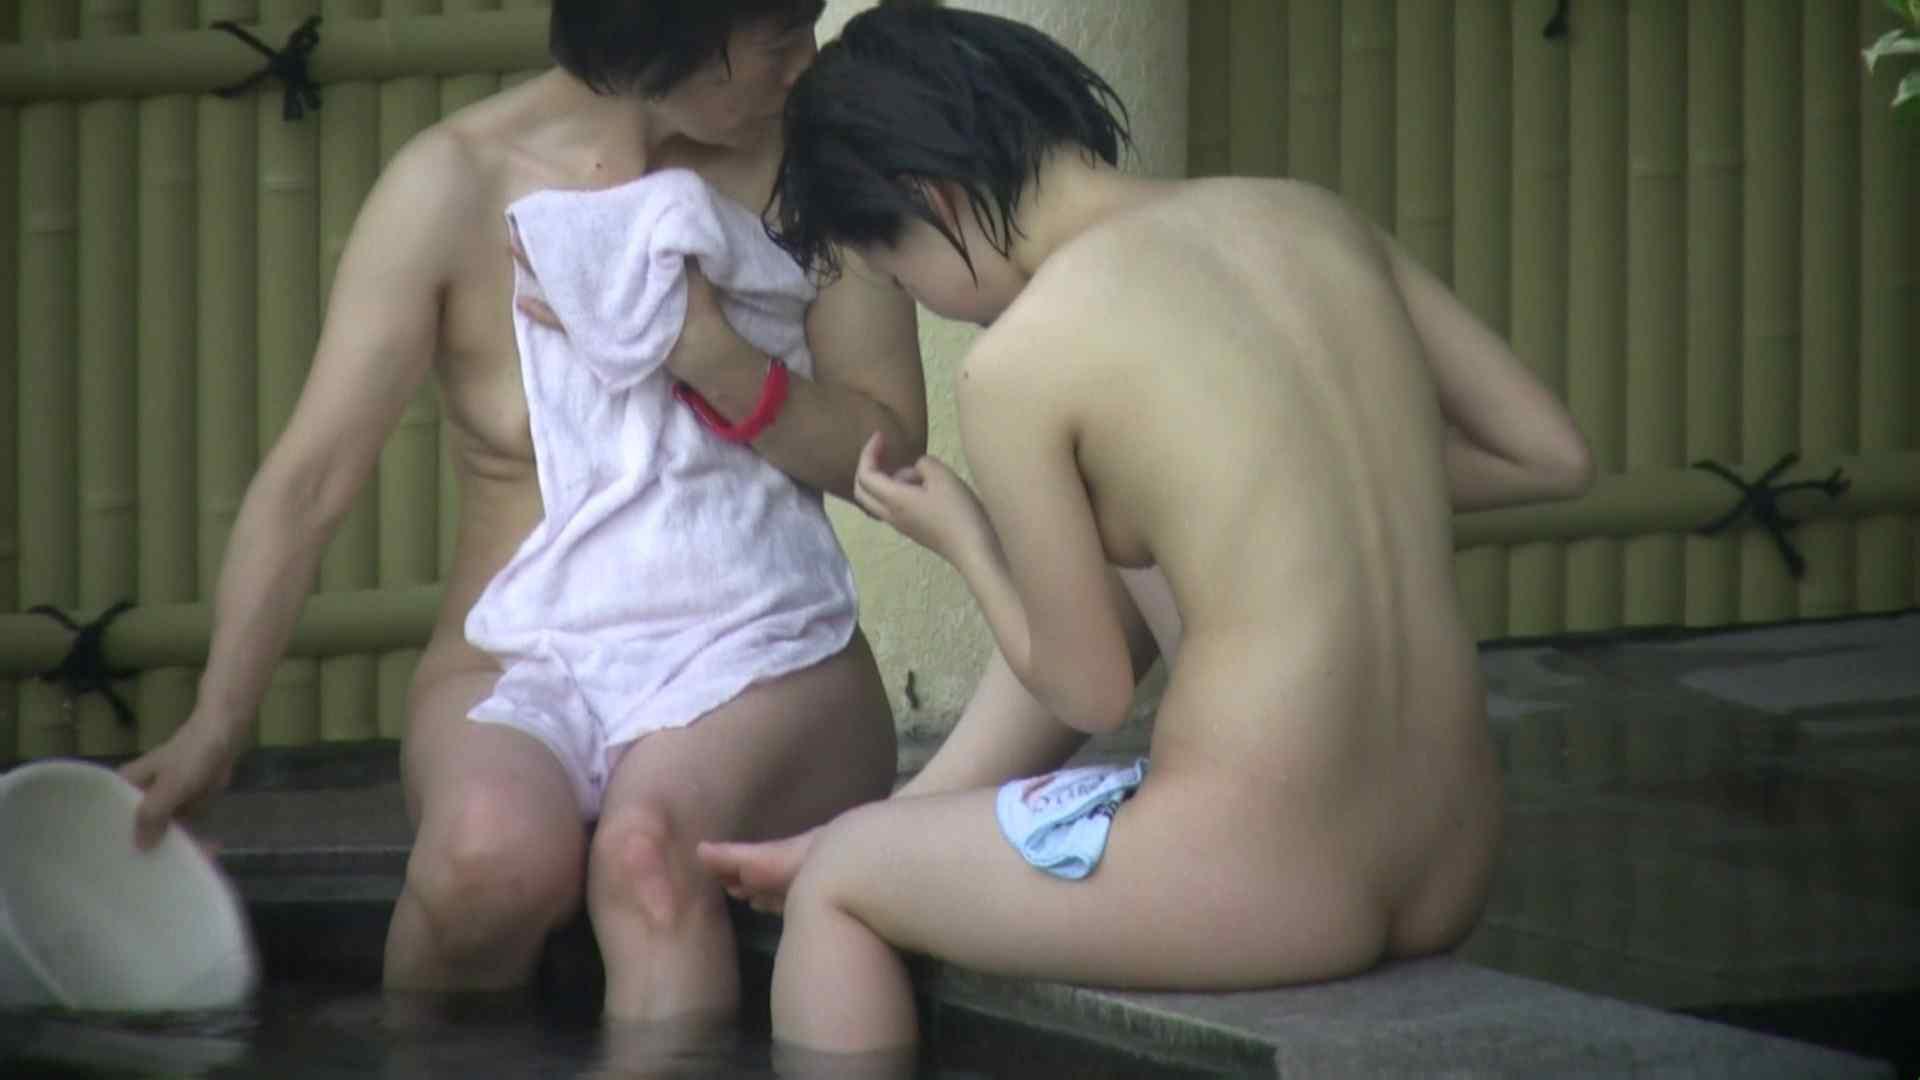 Aquaな露天風呂Vol.06【VIP】 盗撮 | OLエロ画像  113PICs 73